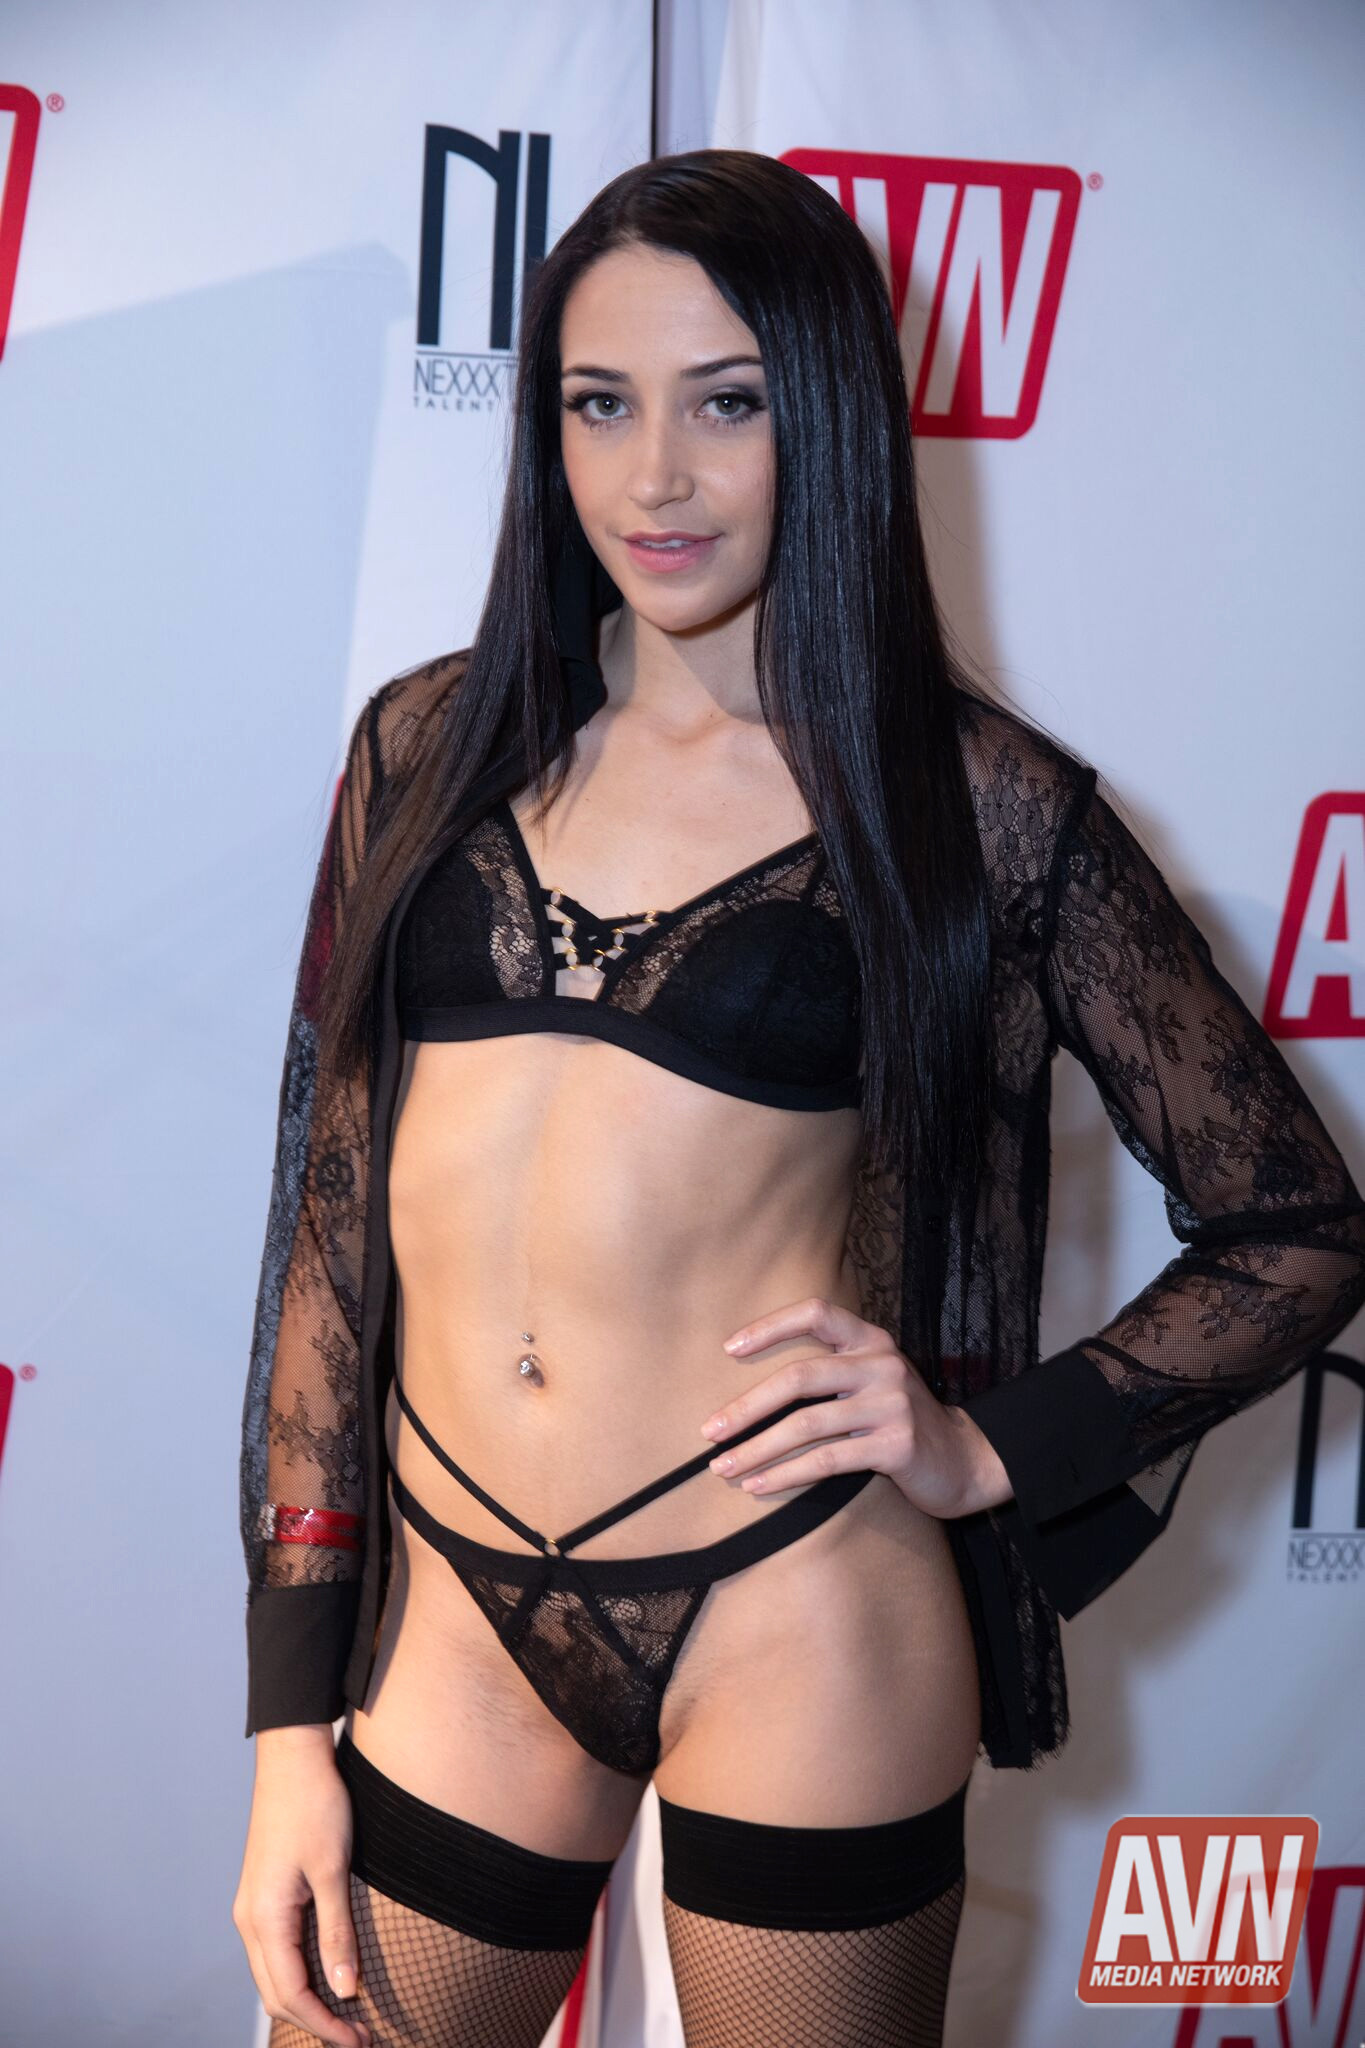 Riley Reid at the AVN Awards 2018 : PornstarFashion